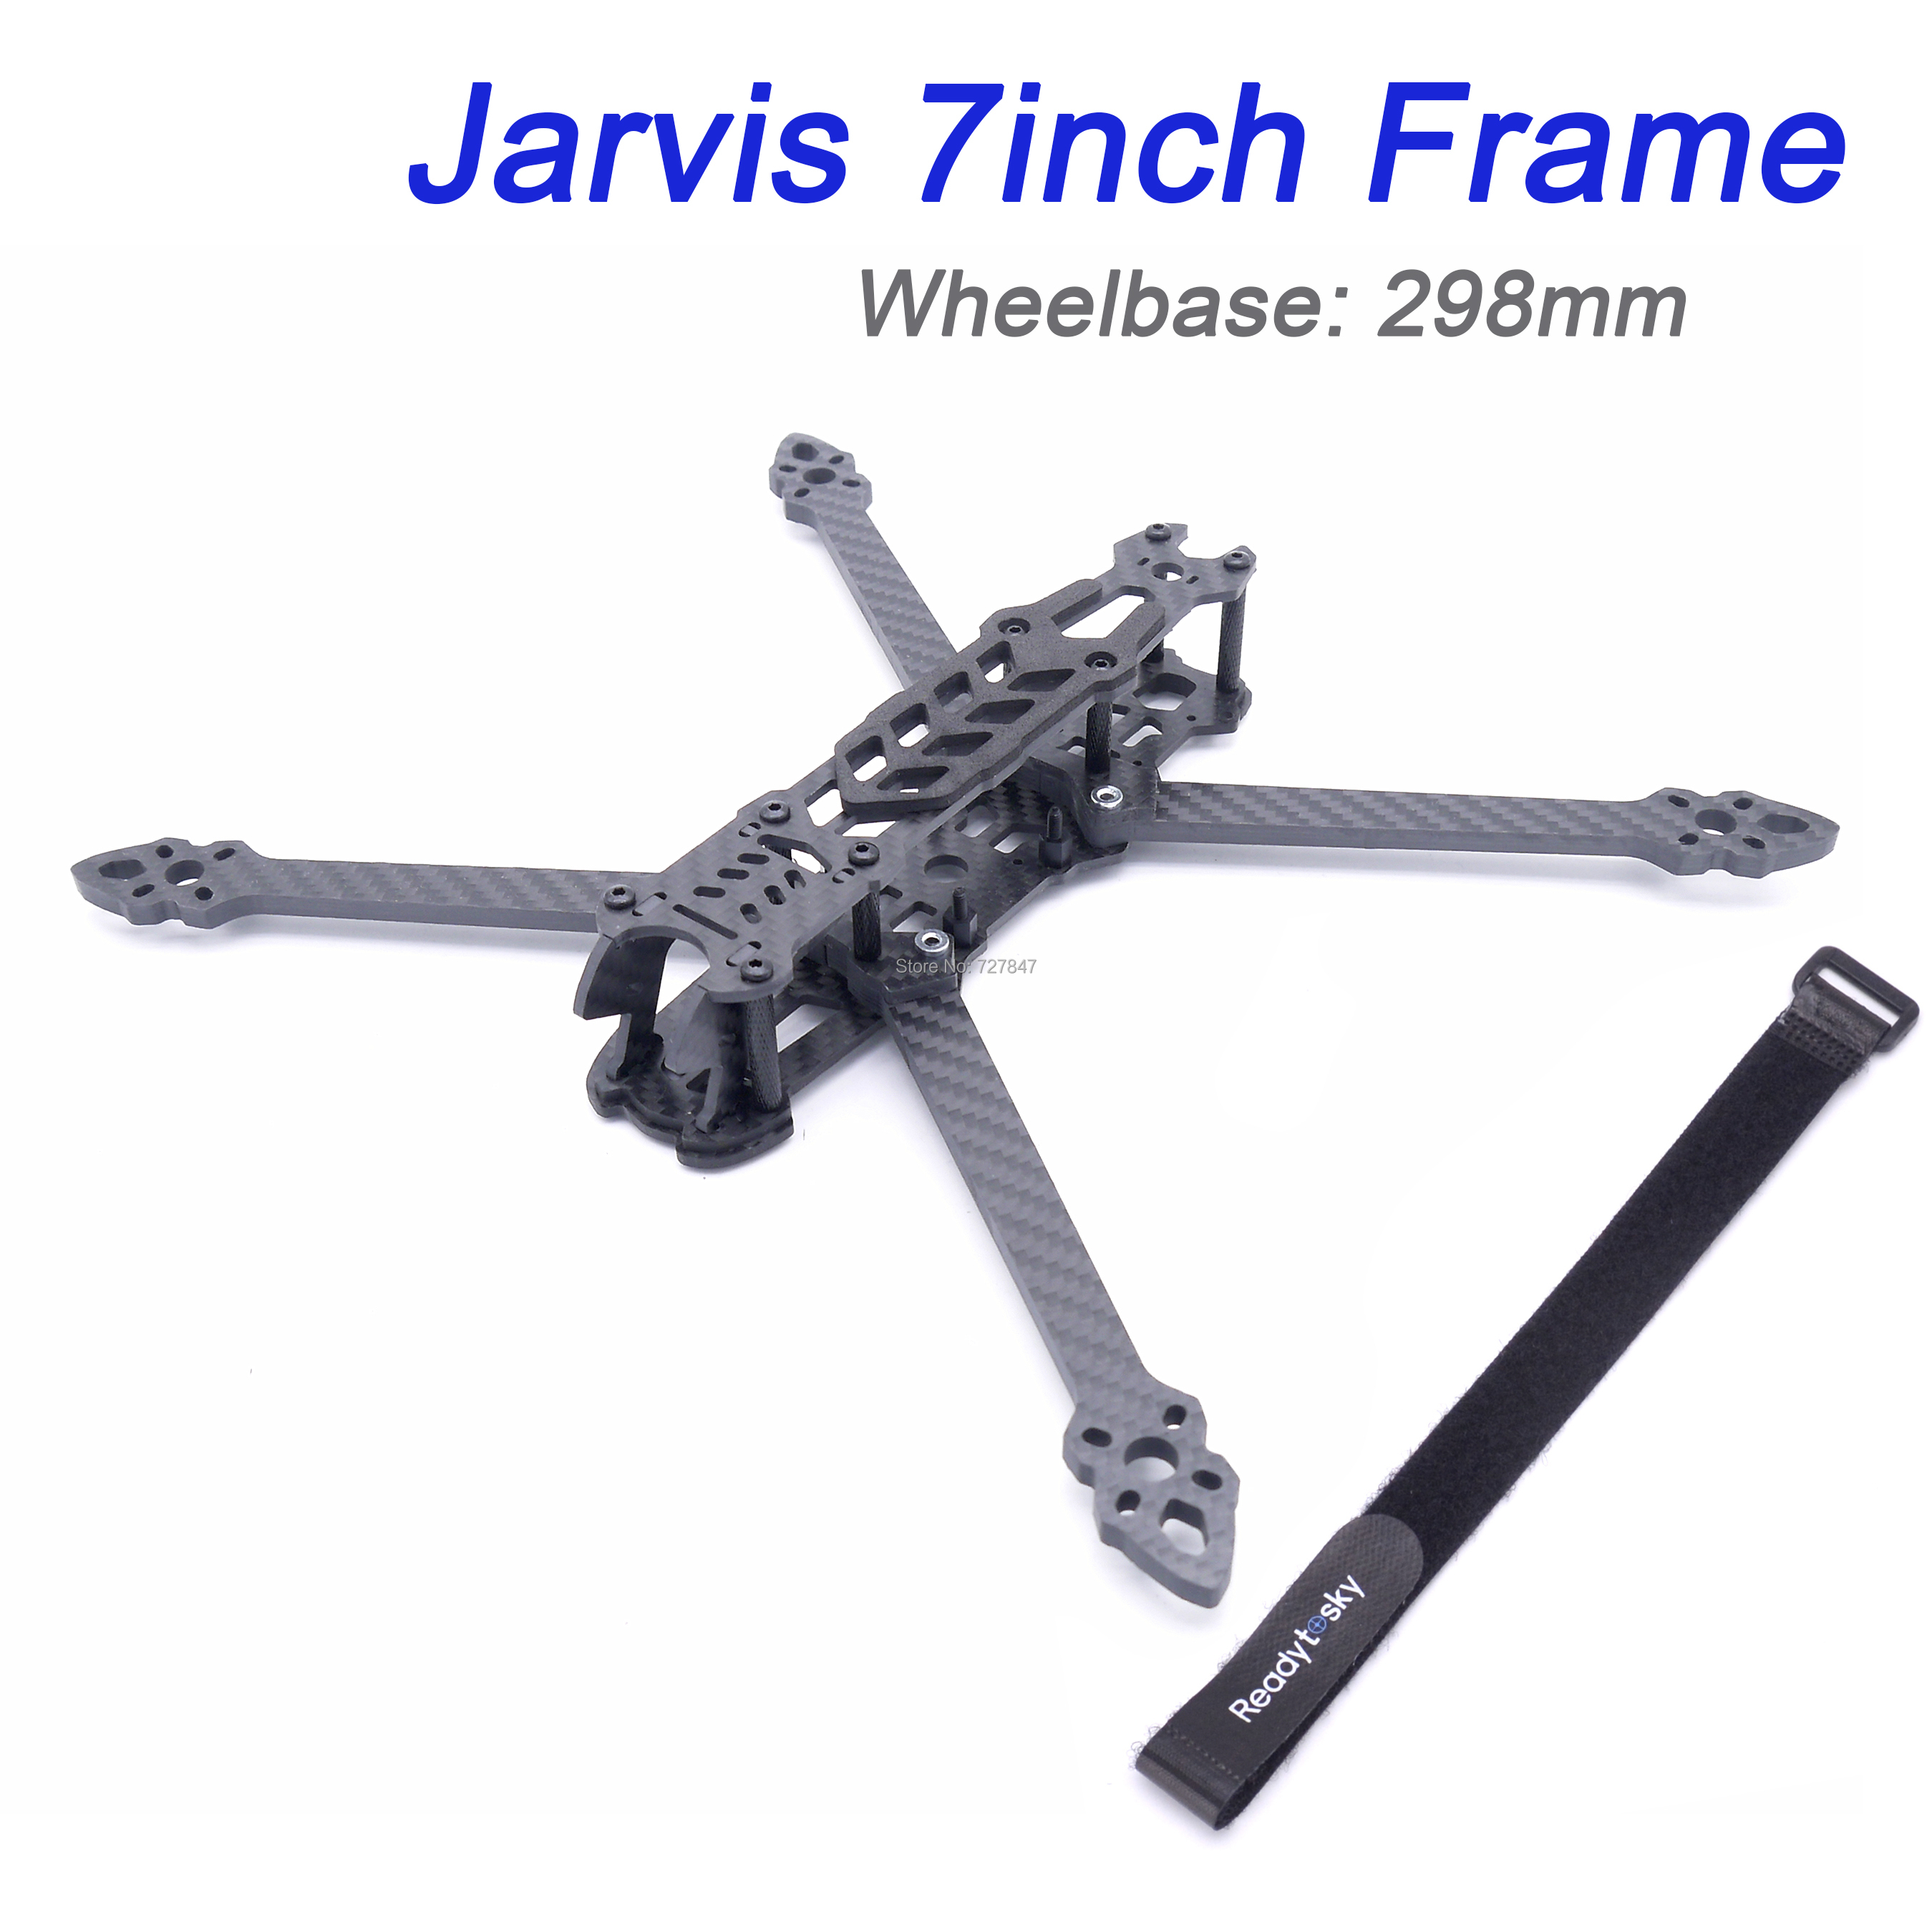 FPV Jarvis 5 zoll 237mm/7 zoll 298mm Carbon fiber w/5mm Arm quadcopter rahmen kit für 2204/2205 2207/2306/2405/2307/2308/2506 Bürstenlosen Motor